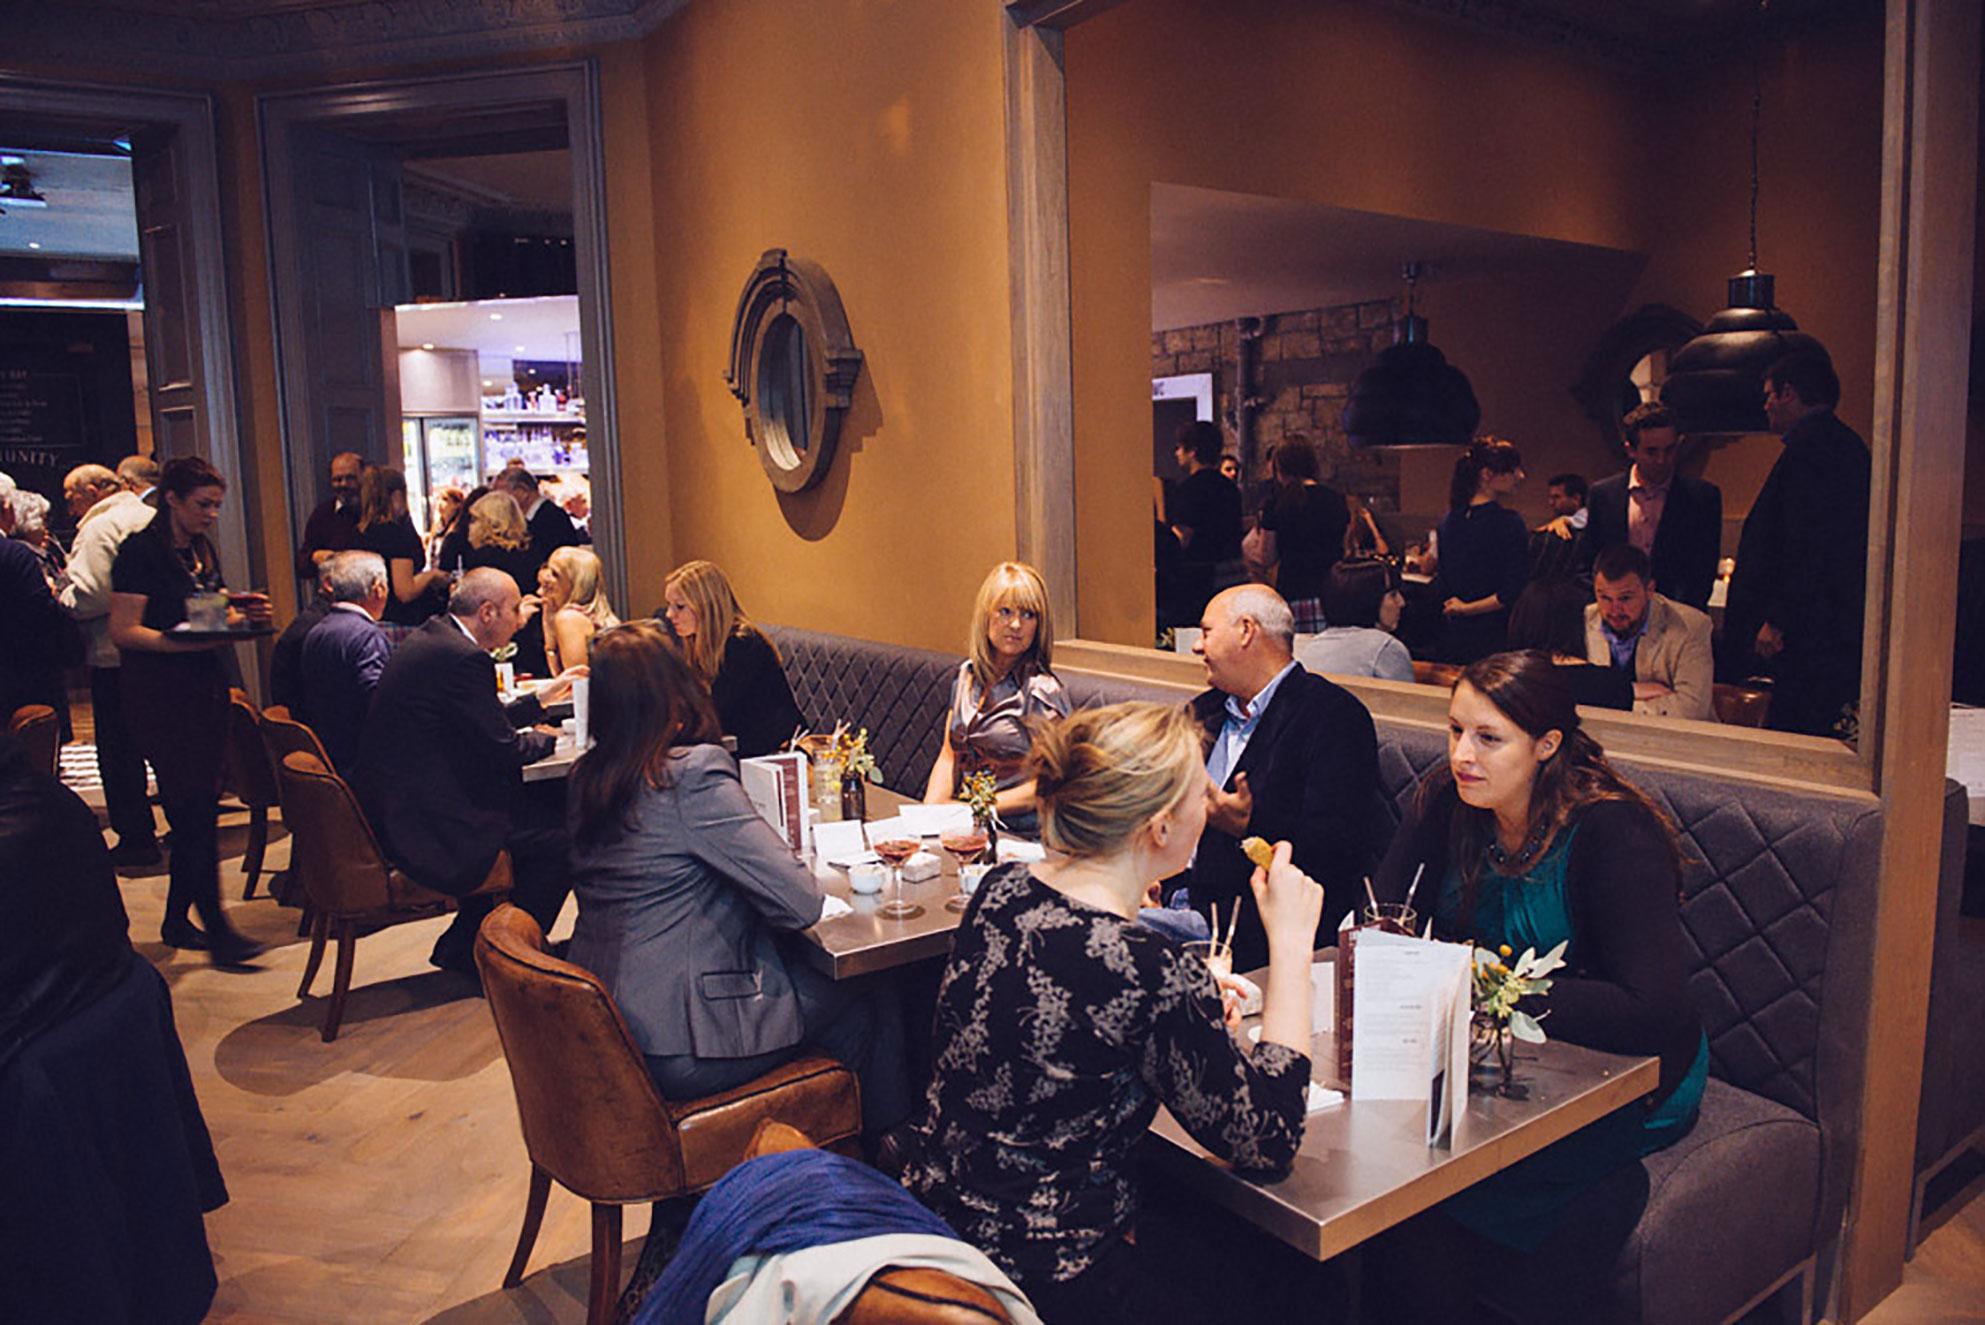 G1-Bothy-Murrayfield-Opening-bar-restaurant-photos-for-web-9